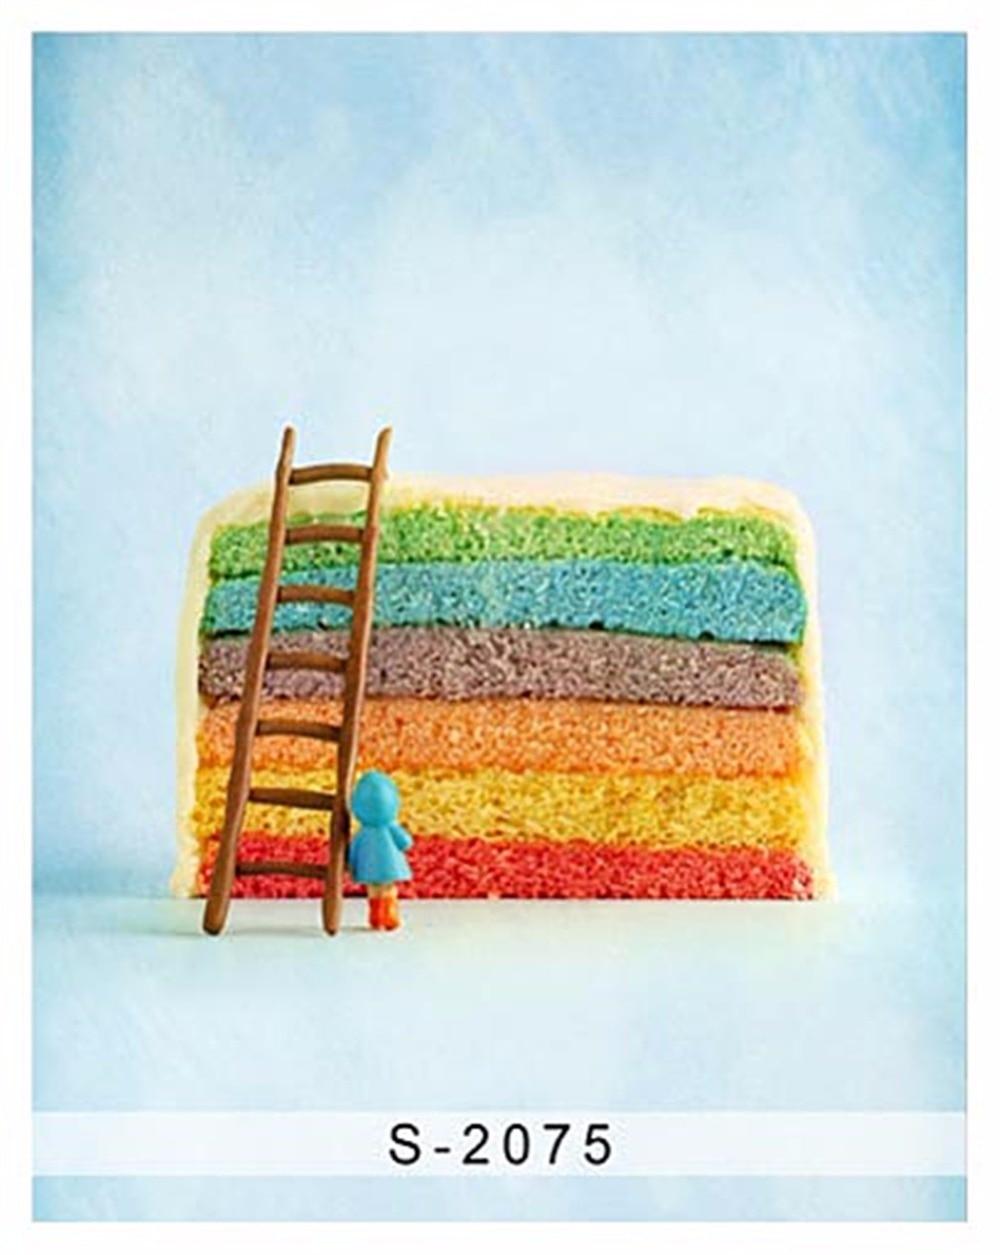 Light Blue Background 150x220cm Rainbow Cake with Wood Ladder Photo Backdrop for Baby Shower Shoot Camera Fotografia Custom Made беспроводная акустика interstep sbs 150 funnybunny blue is ls sbs150blu 000b201